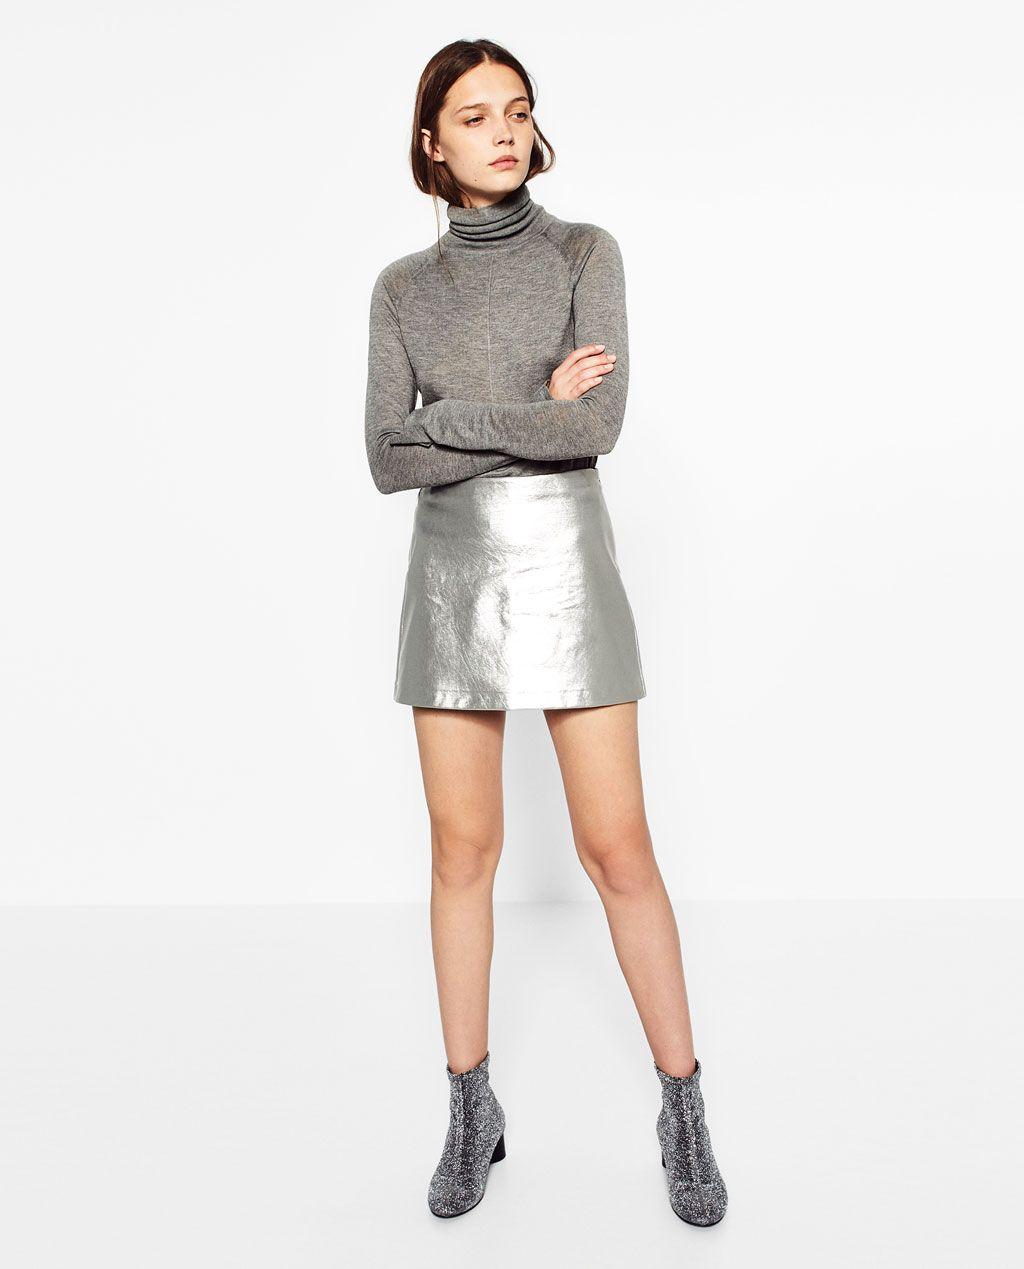 7a074de422 SHORT METALLIC SKIRT-Mini-SKIRTS-WOMAN | ZARA United States | Style ...